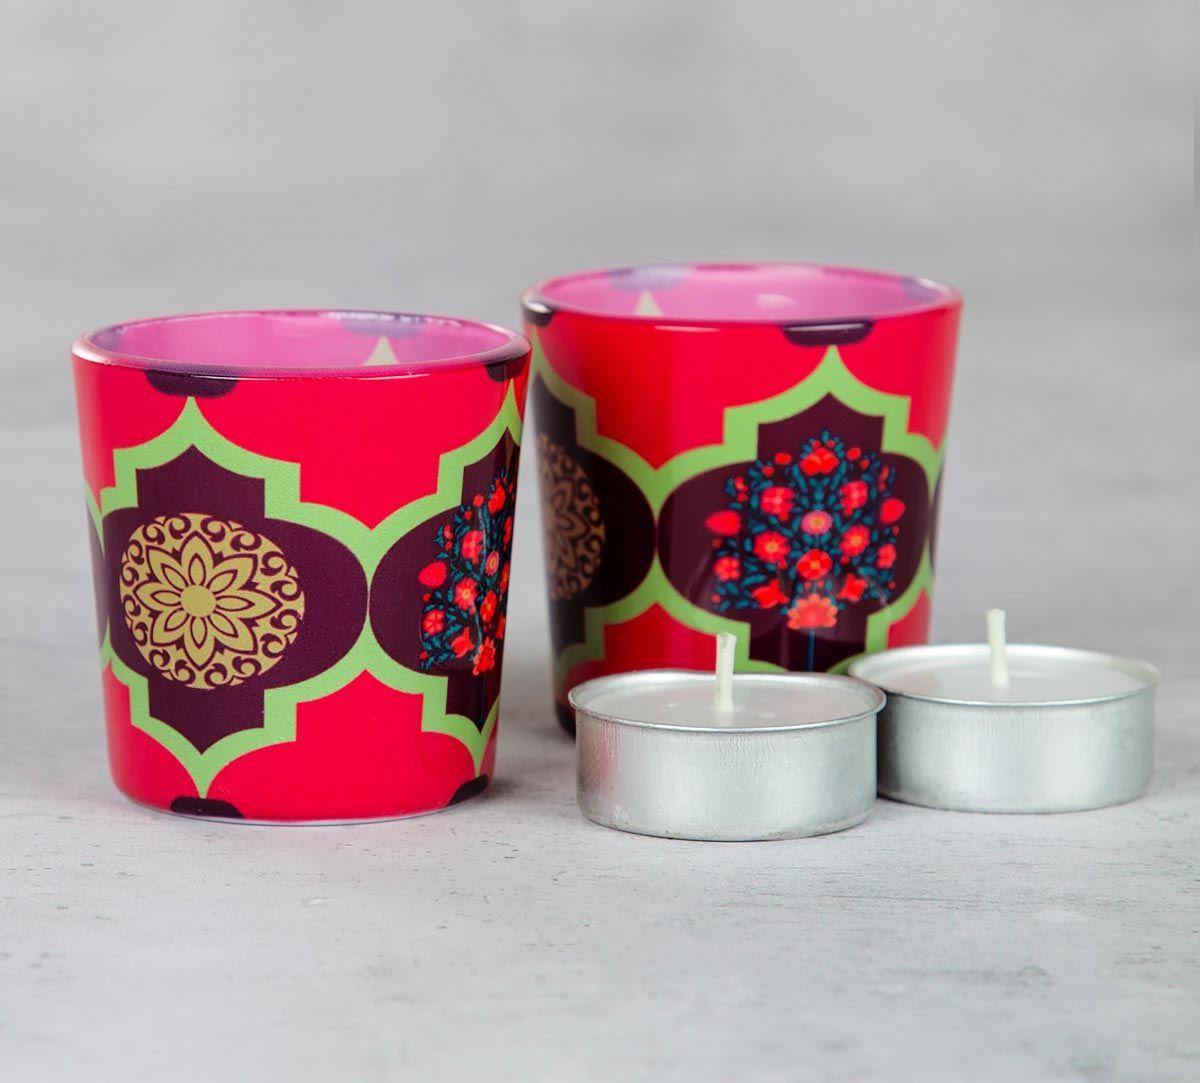 Latticed Synergy Tea Light Holder (Set of 2)